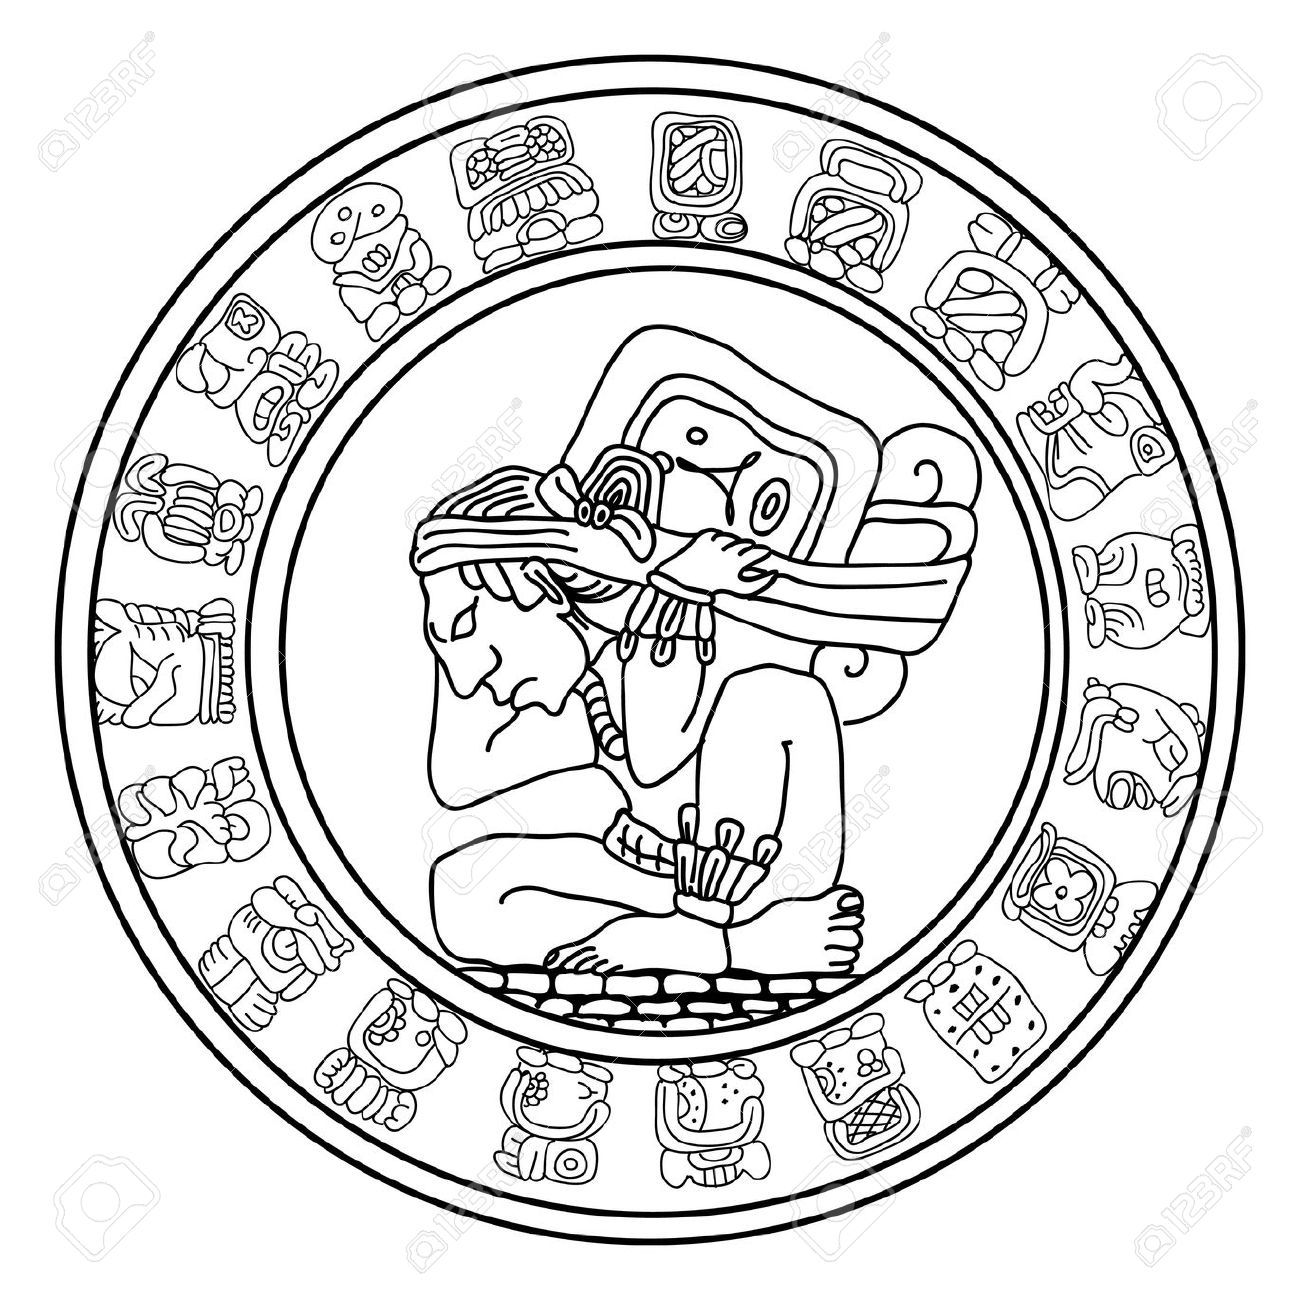 Simbolo royalty free vettori. Aztec clipart maya